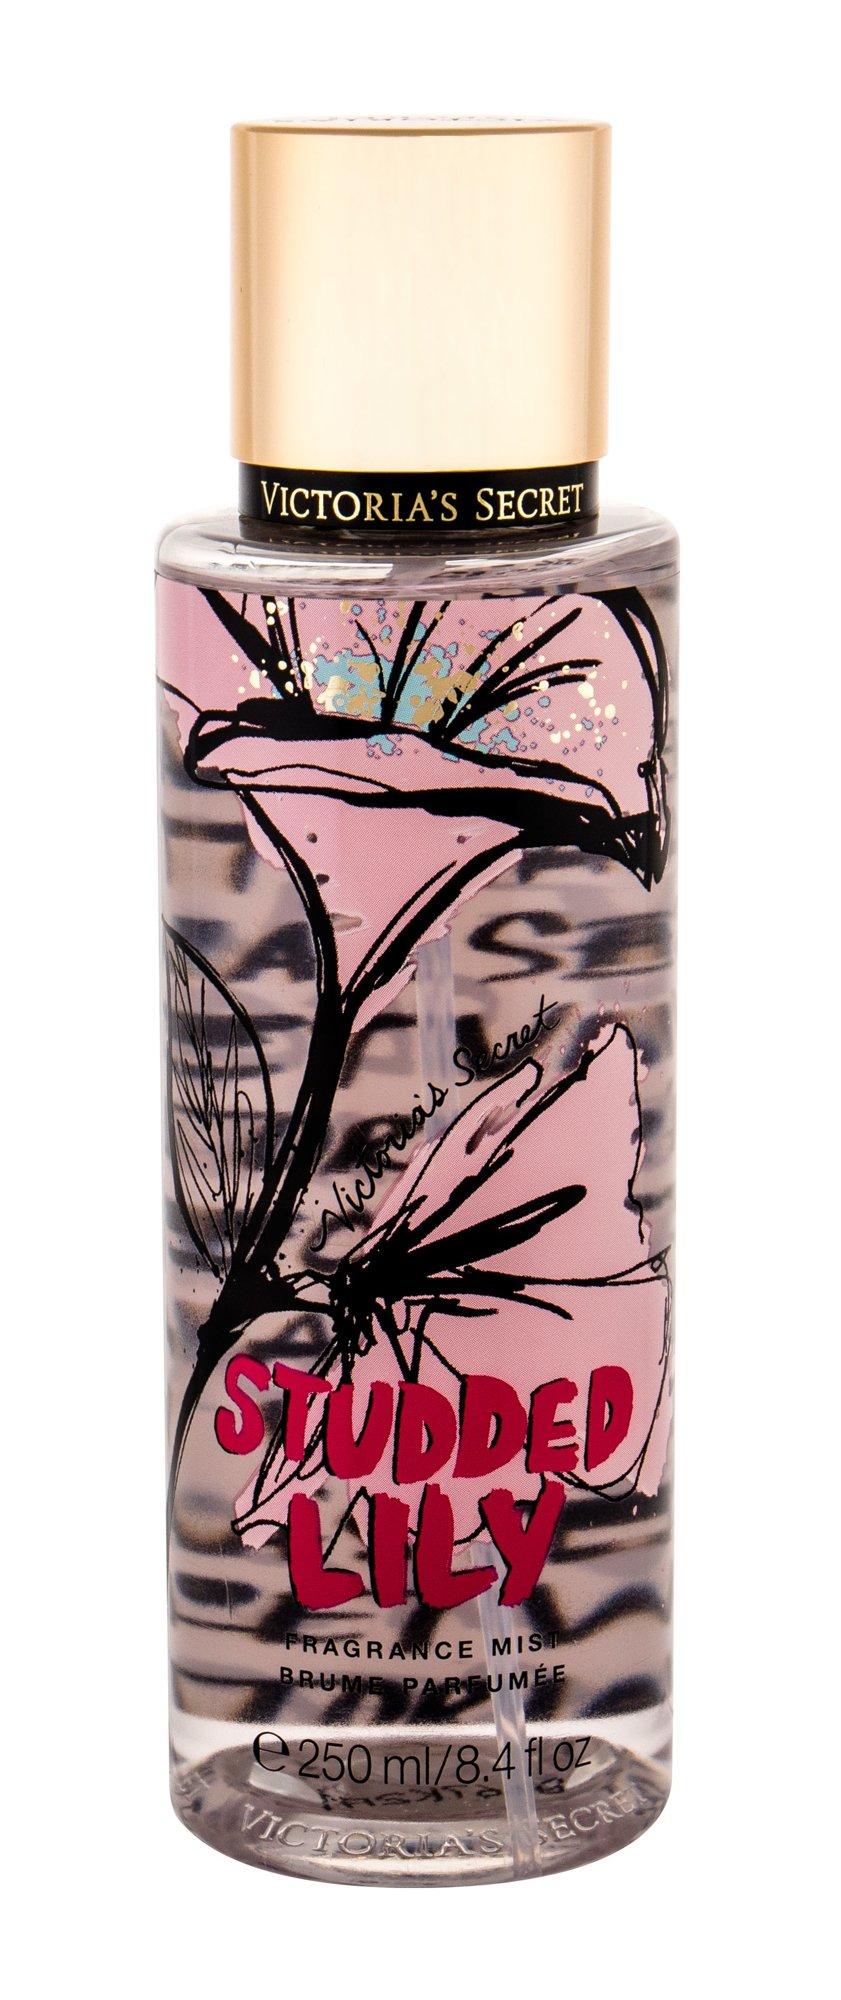 Victoria´s Secret Studded Lily Body Spray 250ml